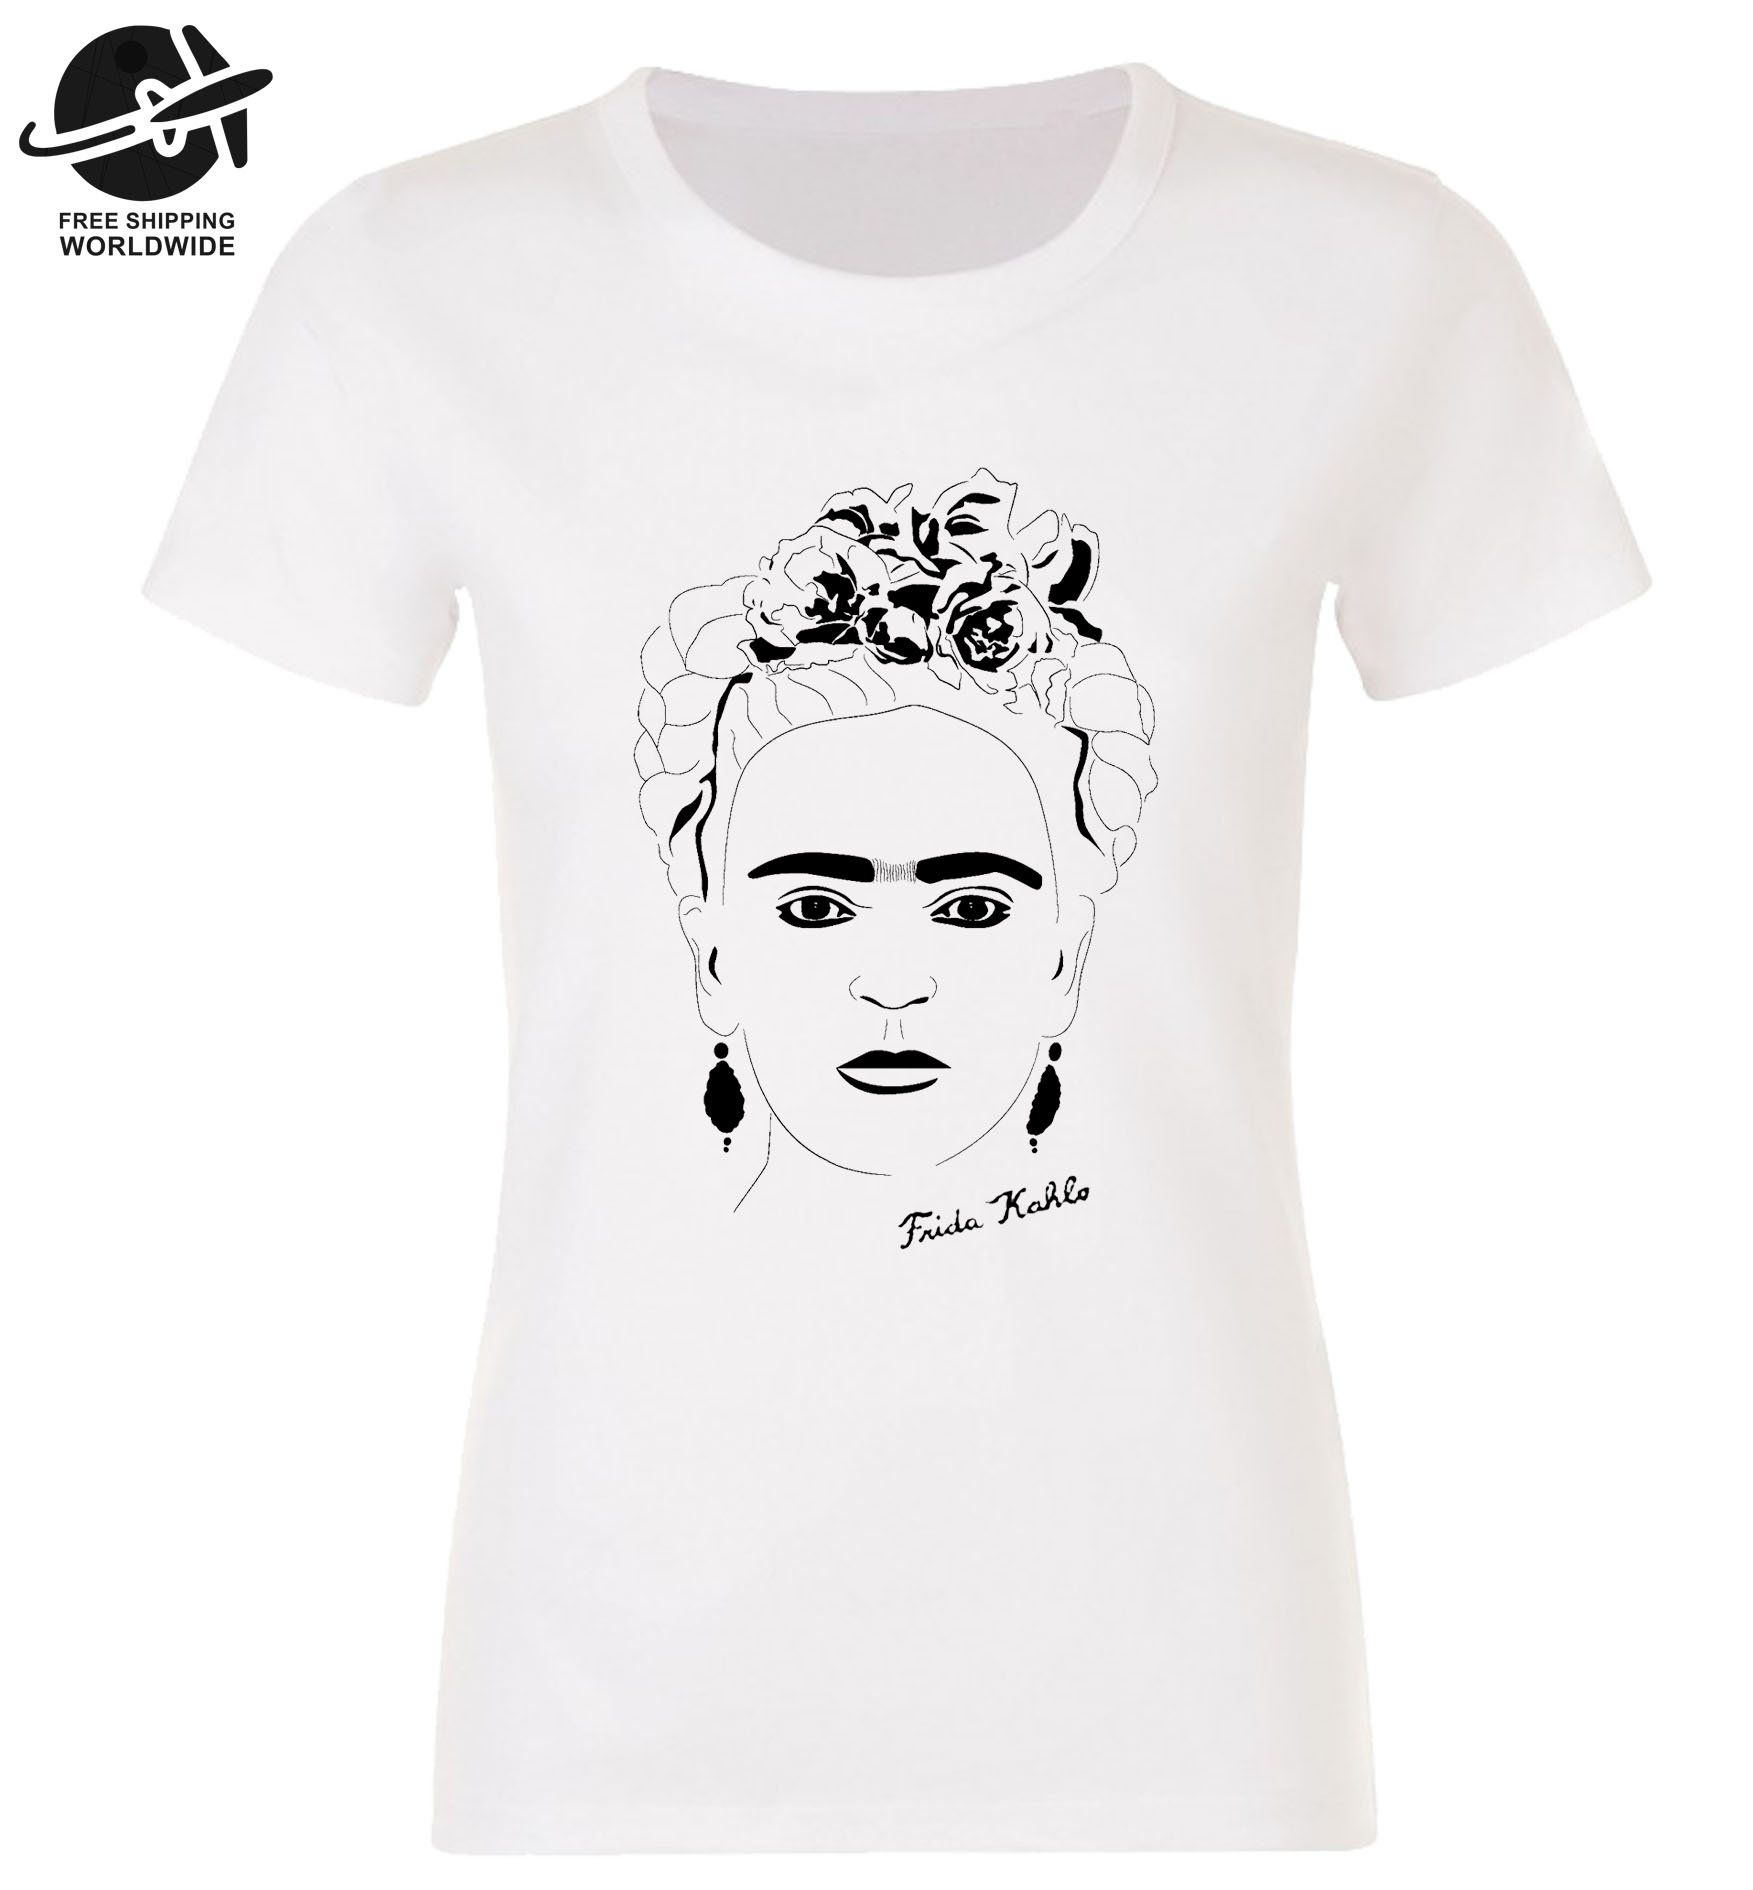 White Frida Kahlo T-Shirt Bella Canvas 100/% White Cotton Unisex Tee for Men and Women